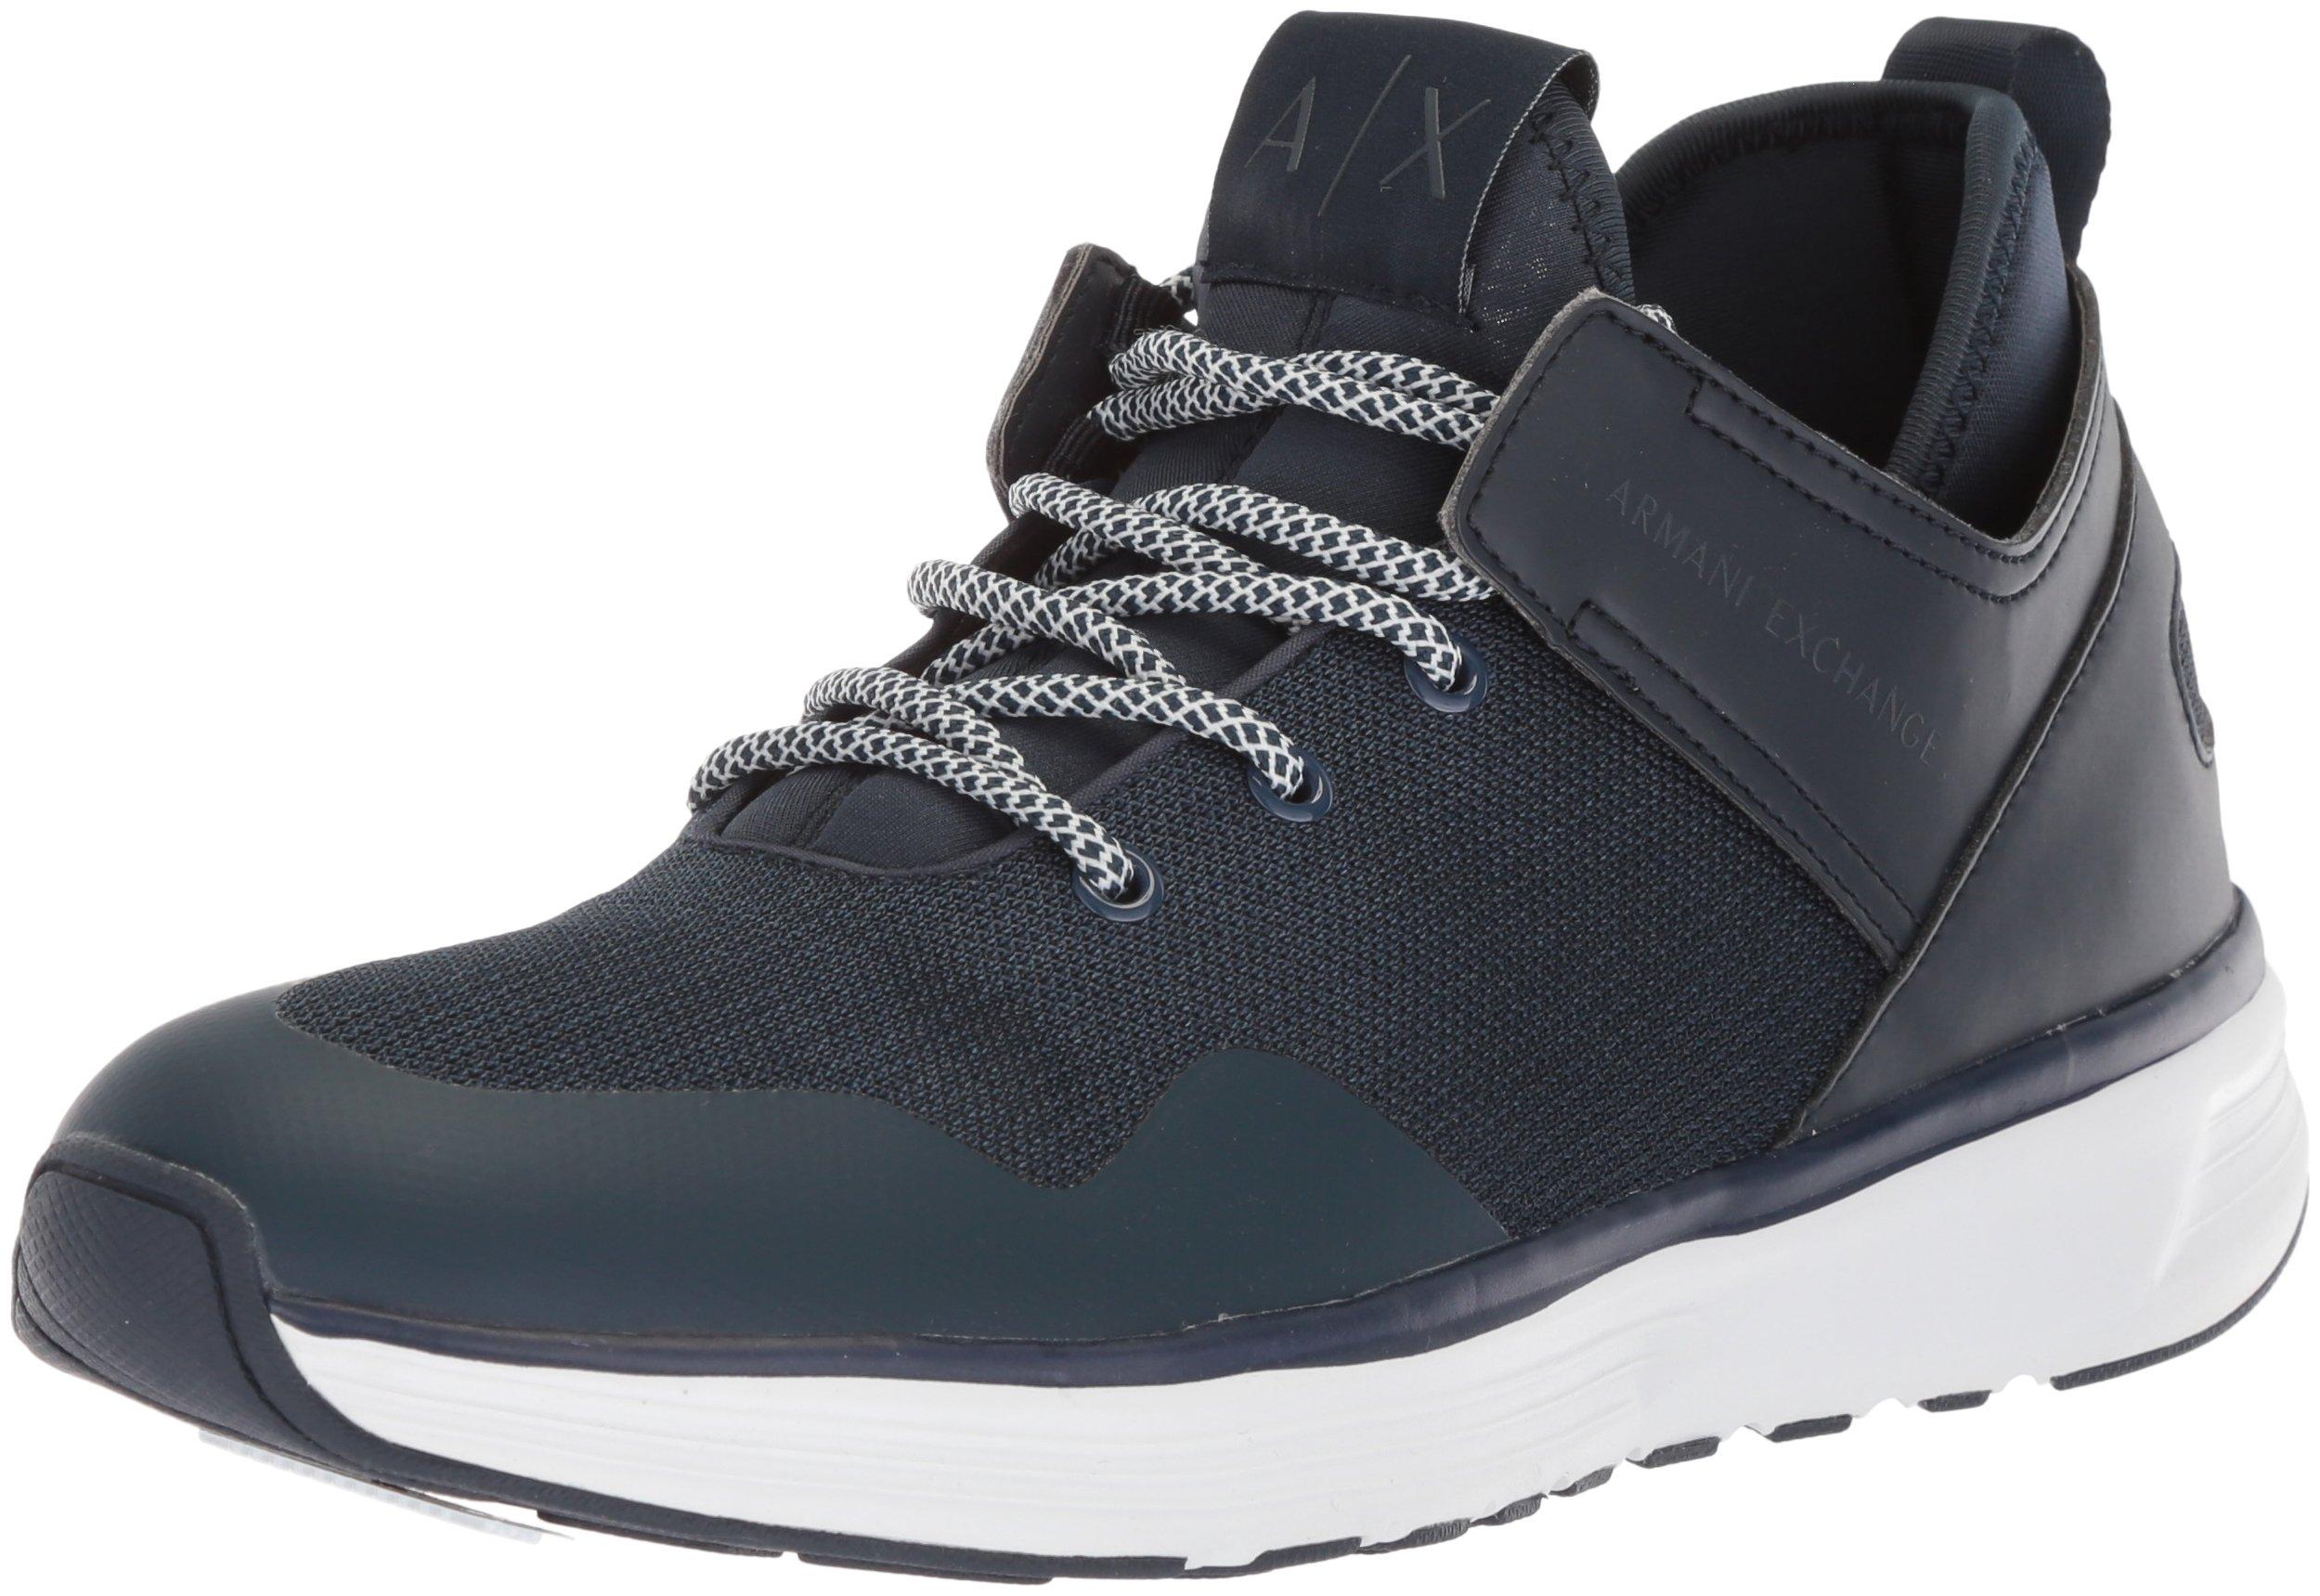 A|X Armani Exchange Men's Mid Cut Lace up Sneaker, Navy, 9 Medium US